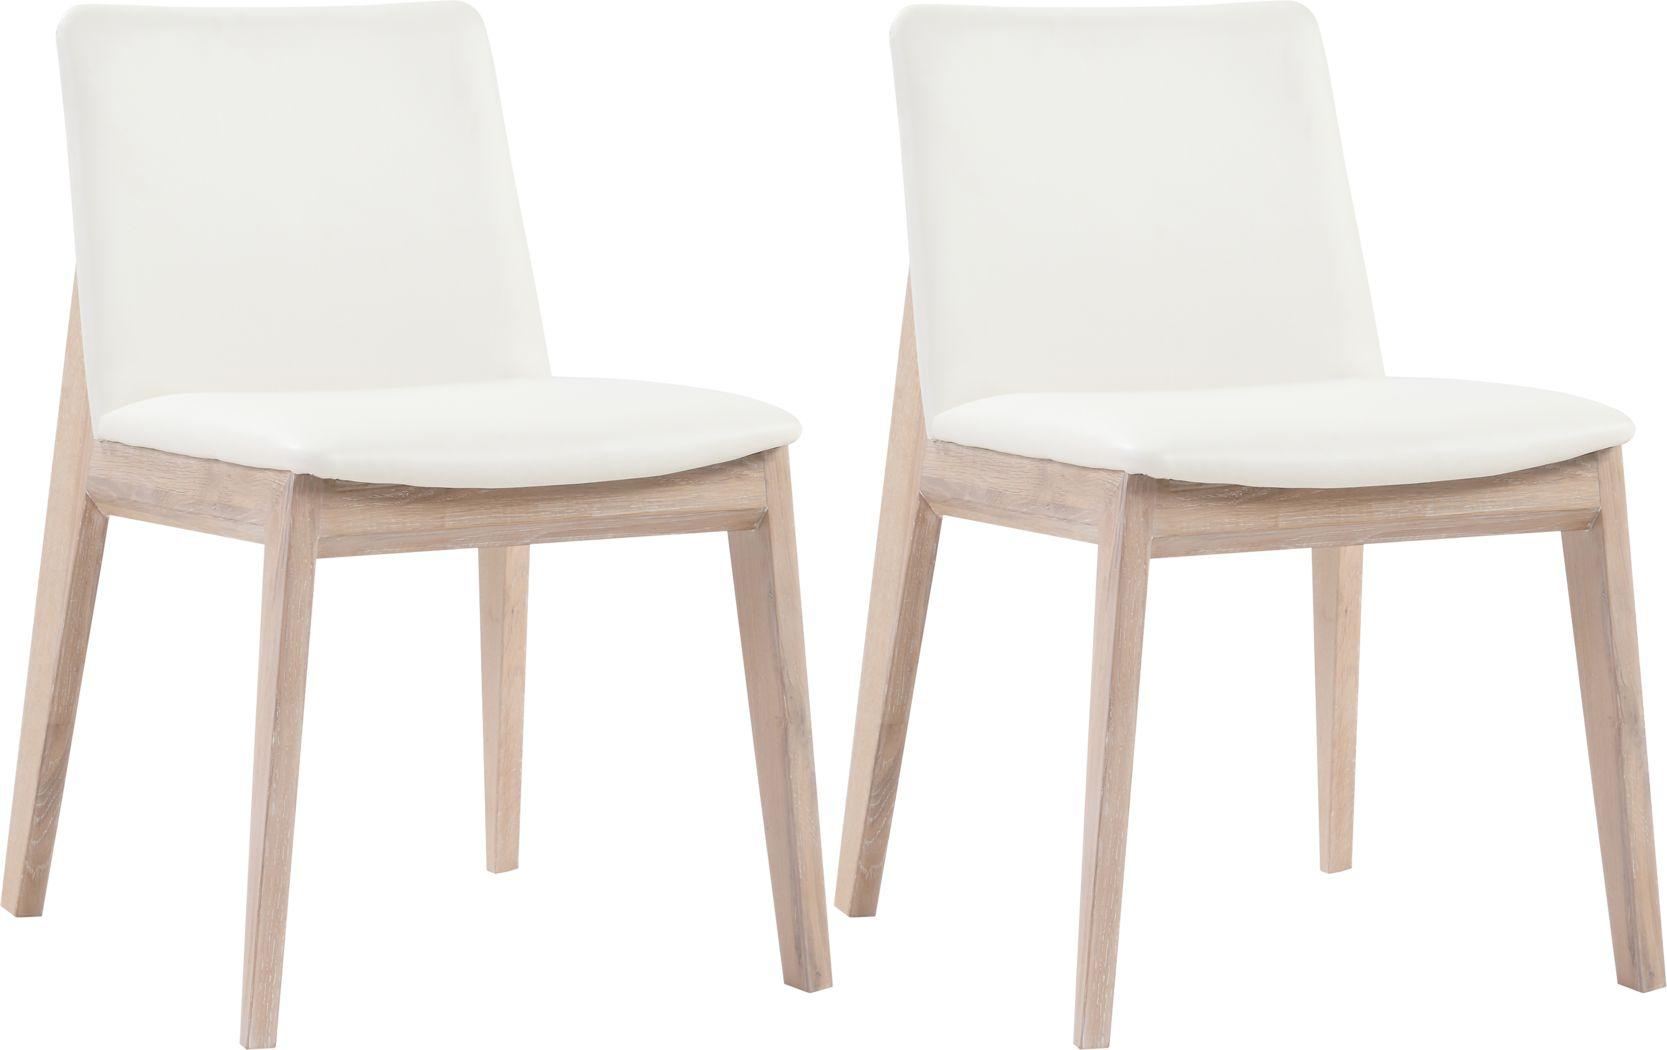 Bayard Way White Dining Chair, Set of 2